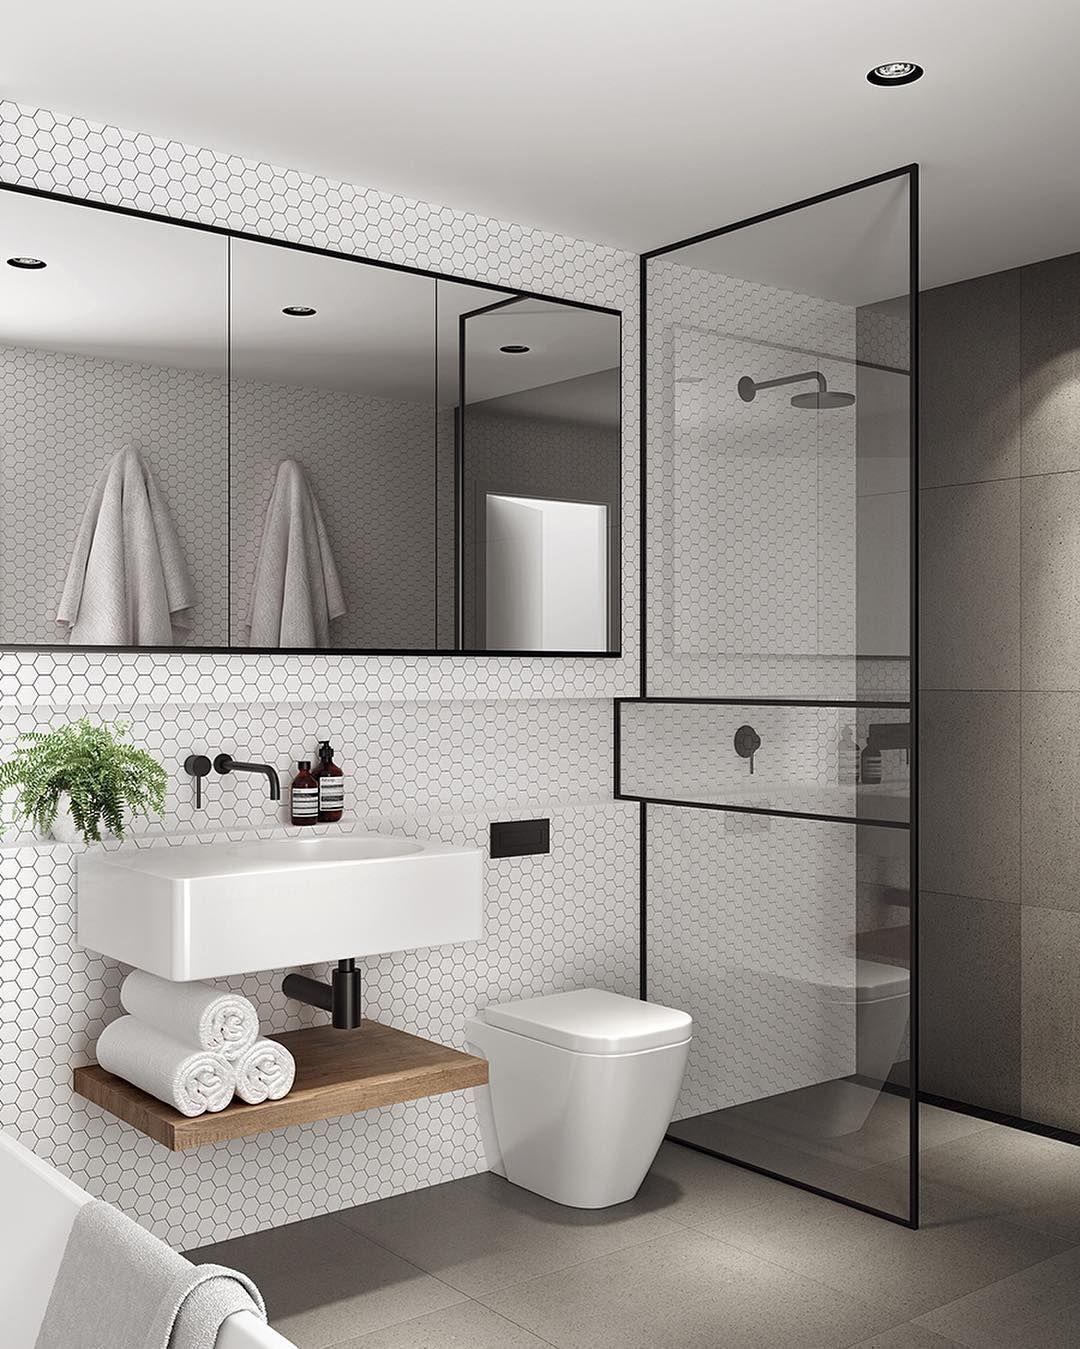 50 Bathroom Ideas Best Bathroom Interior Design Ideas With Photos Scandinavian Small Bathrooms Scandinavian Interior Design Scandinavian Bathroom Design Ideas